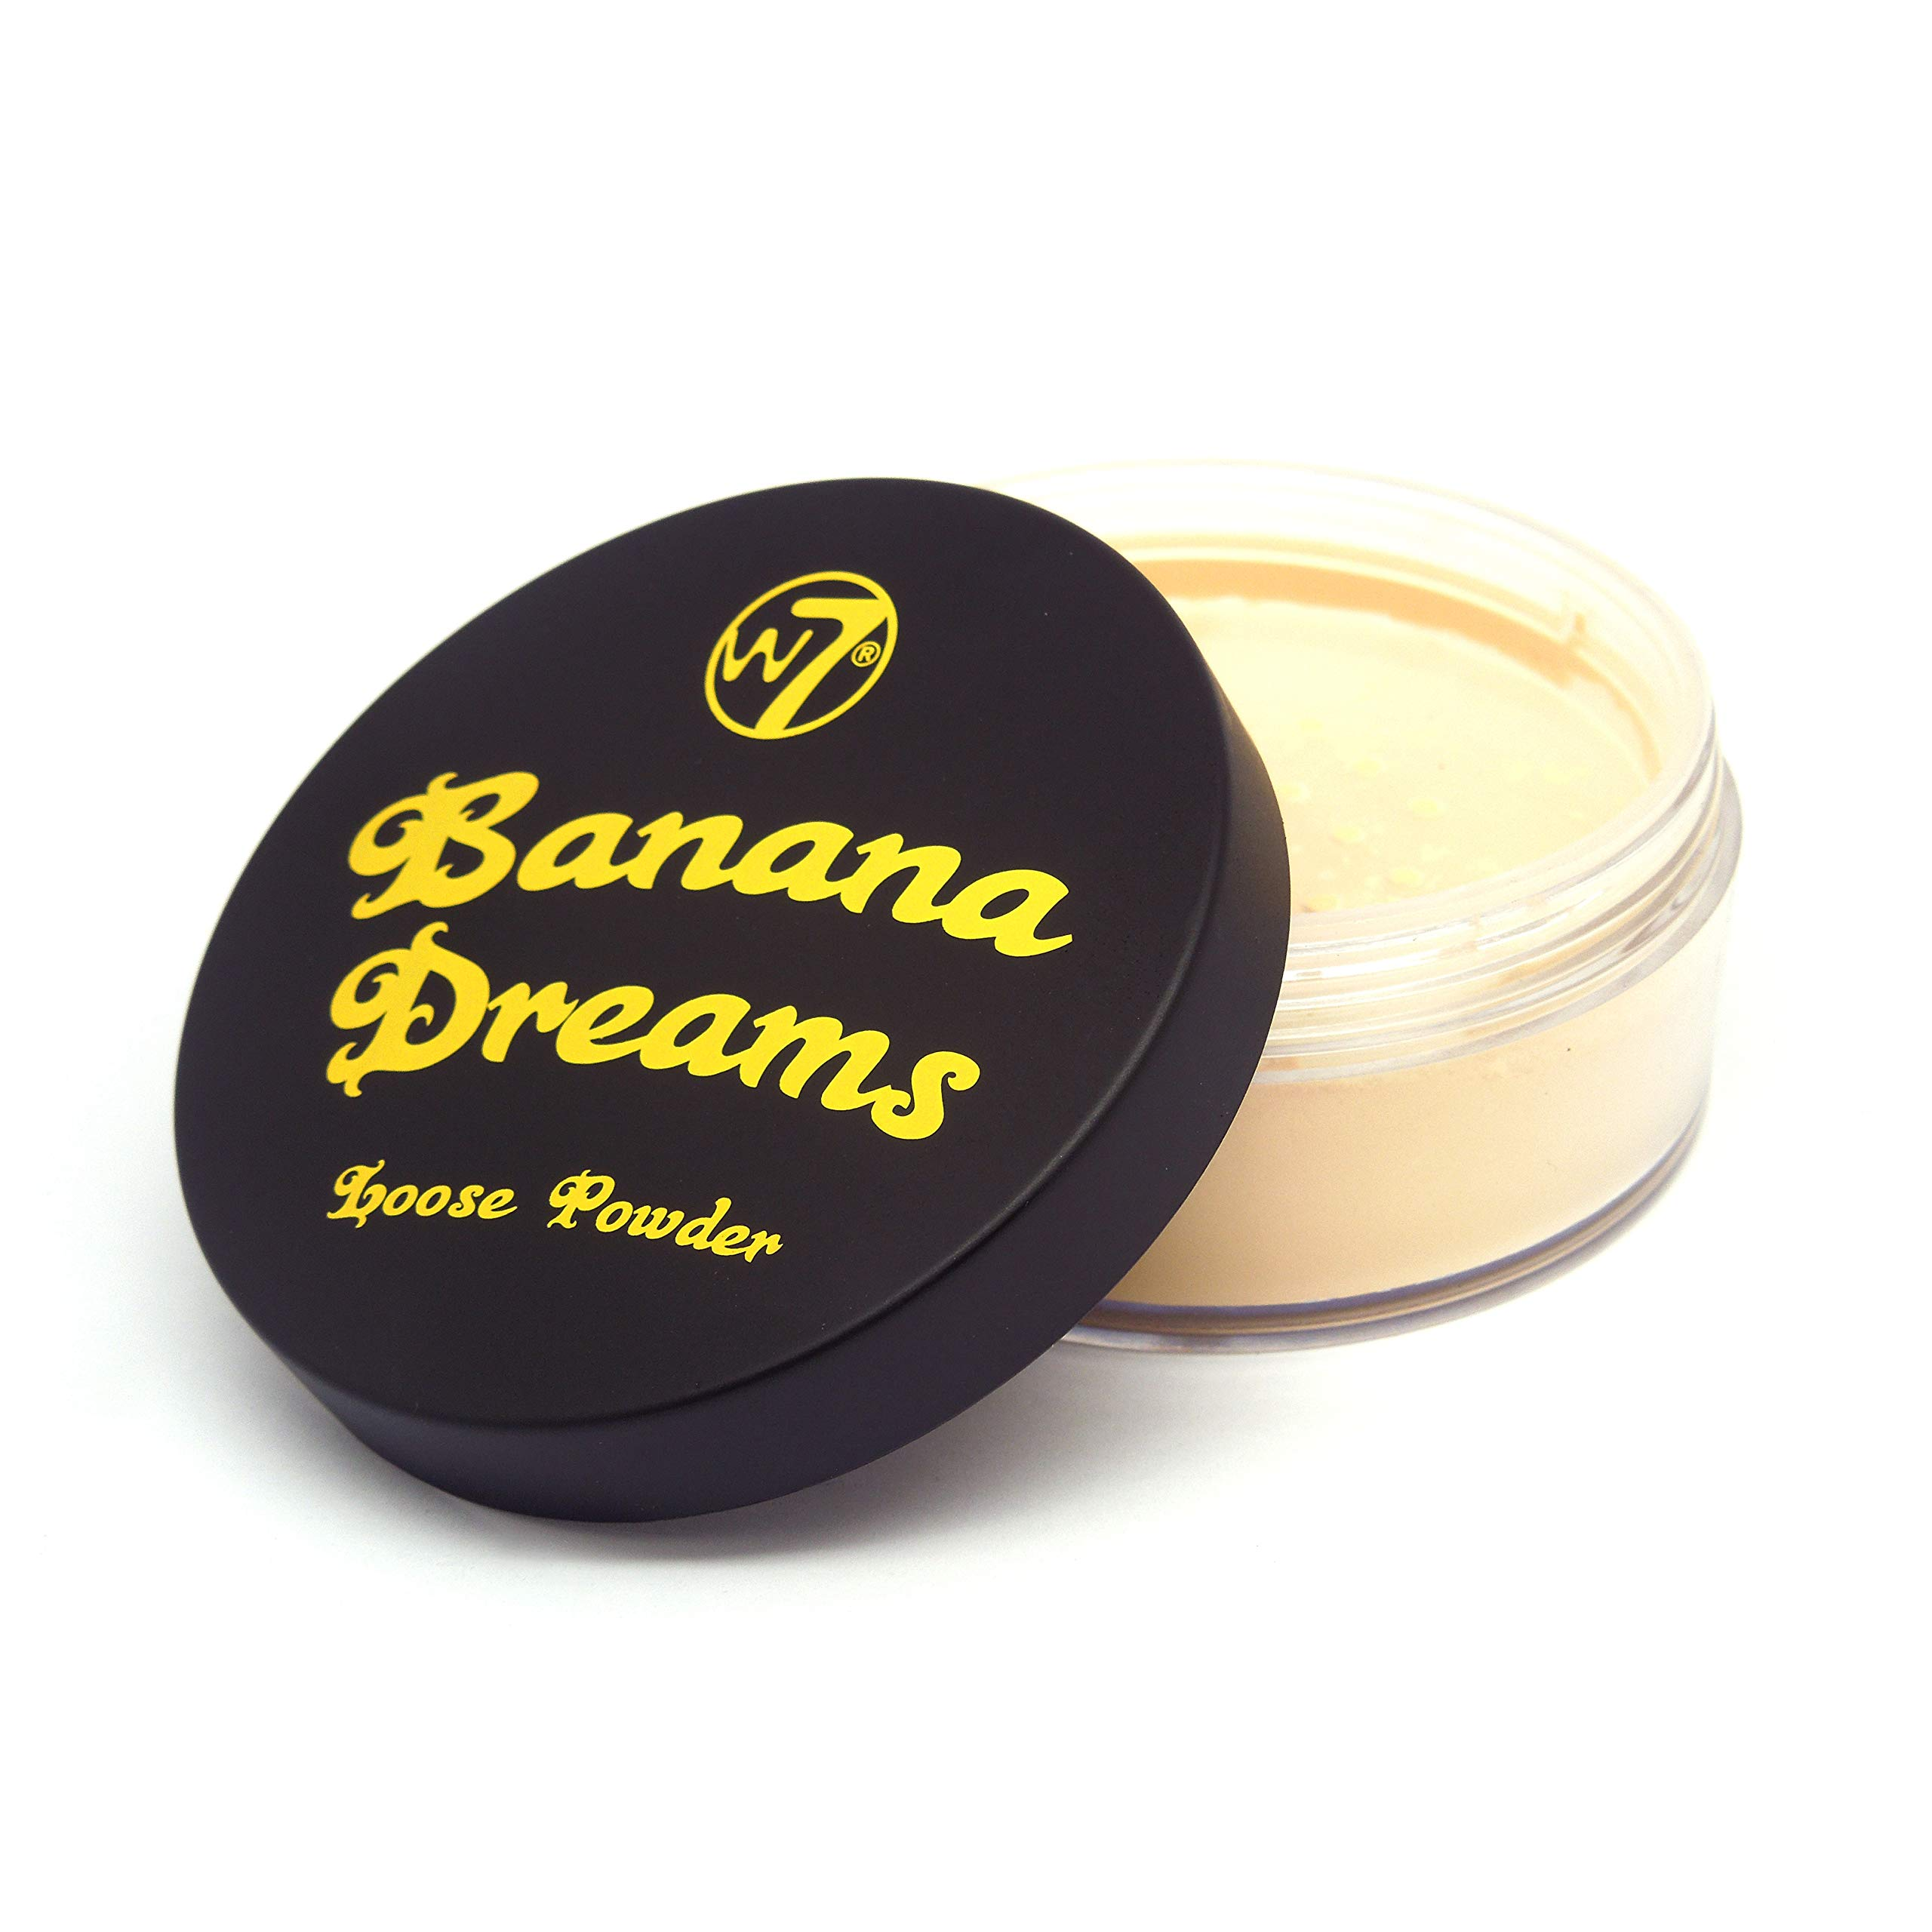 W7 | Banana Dreams Loose Face Powder Makeup | Yellow Setting Powder Suitable For All Skin Tones | Cruelty Free, Vegan Makeup For Women